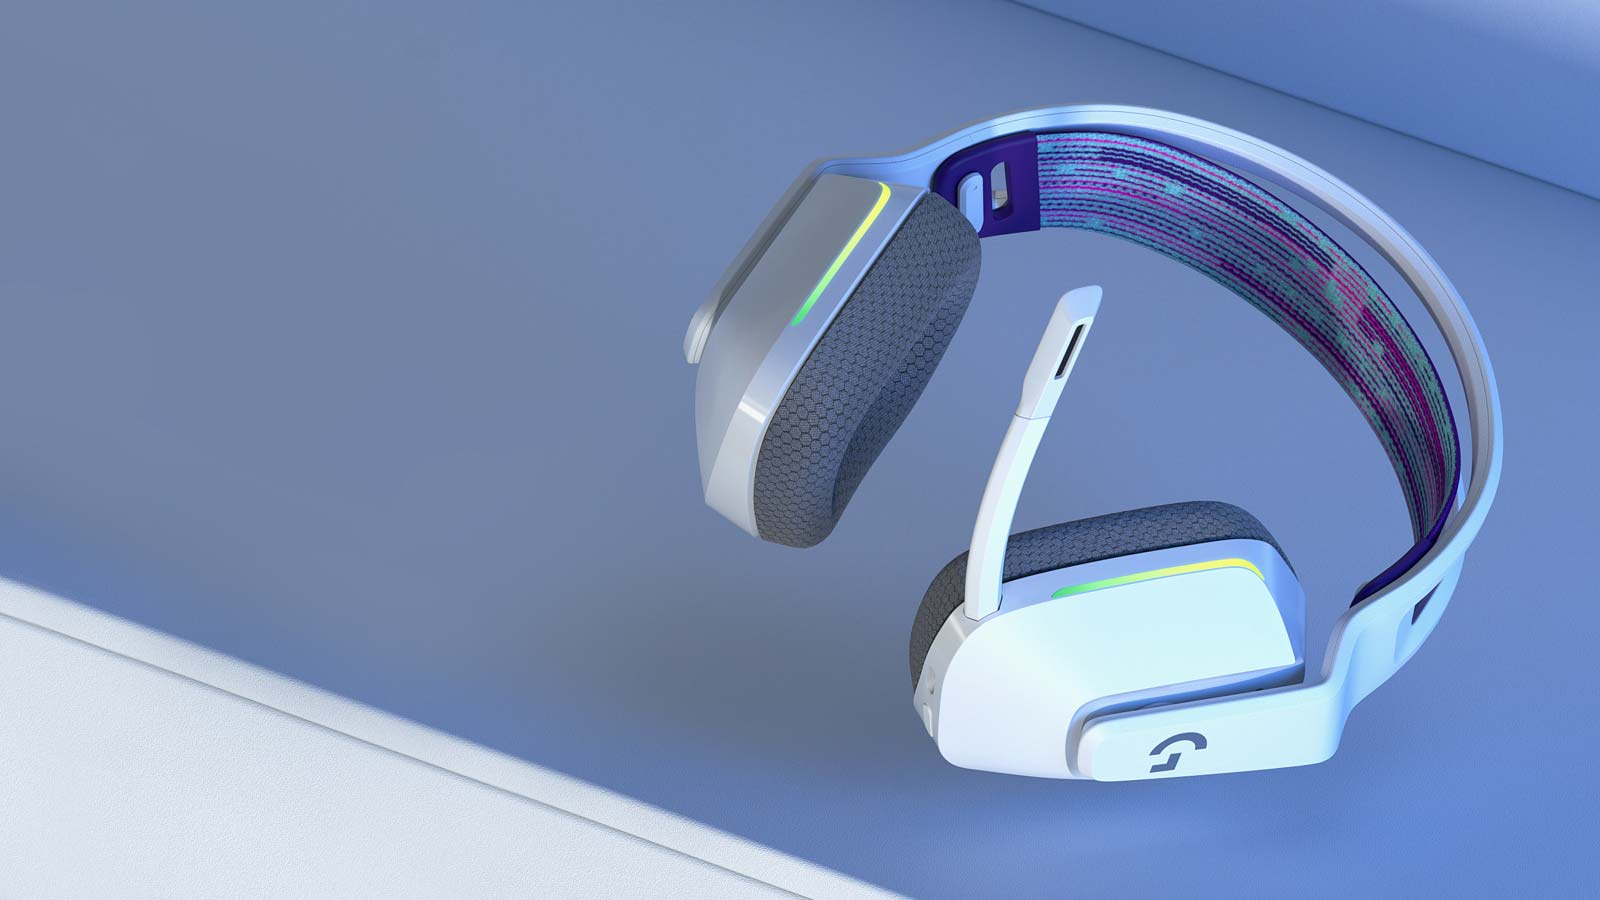 Best wireless gaming headsets: Logitech G733